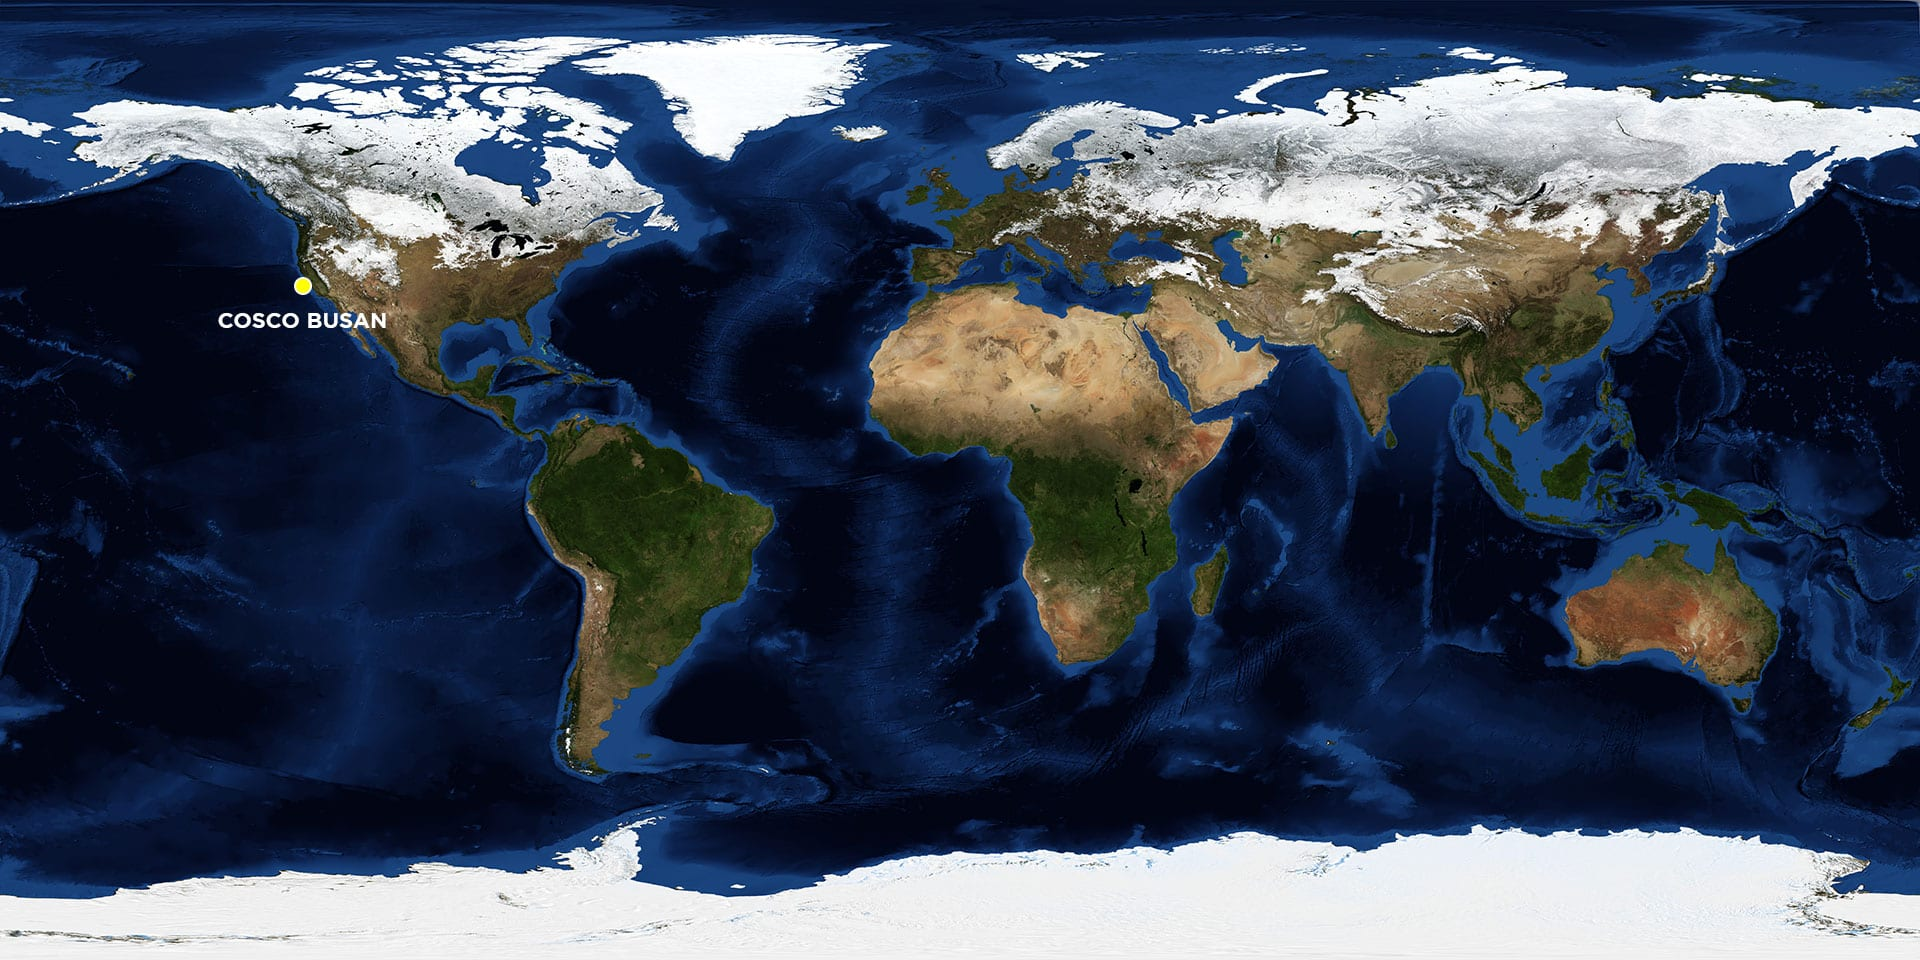 earth-oilspills-bosun